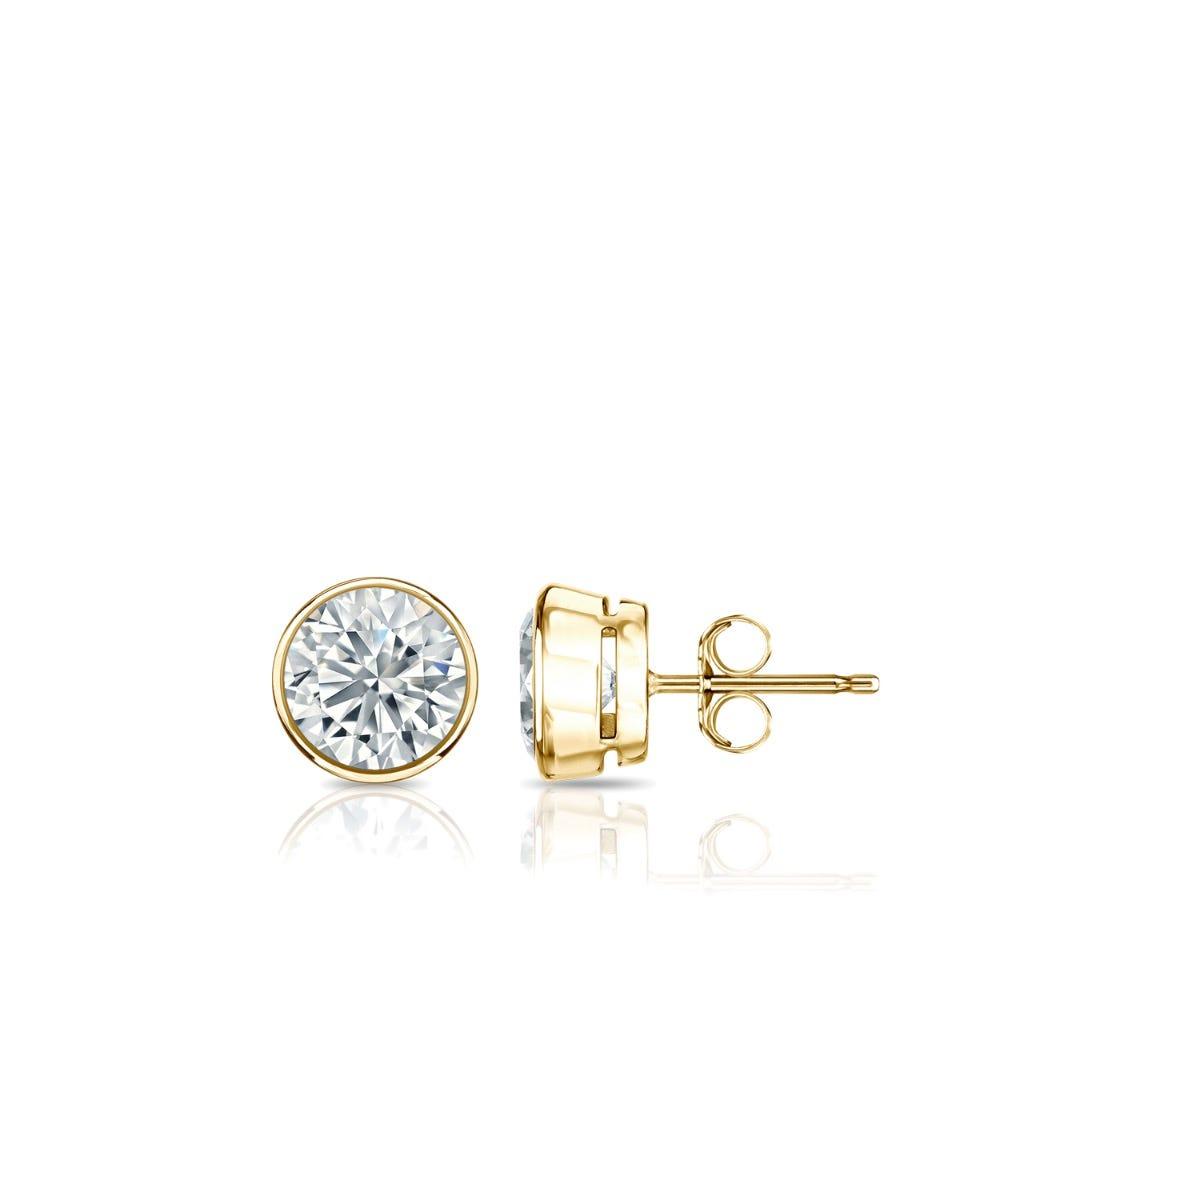 Diamond Round Bezel-Set 1/3ctw. Solitaire Stud (IJ-SI2) Earrings in 18K Yellow Gold